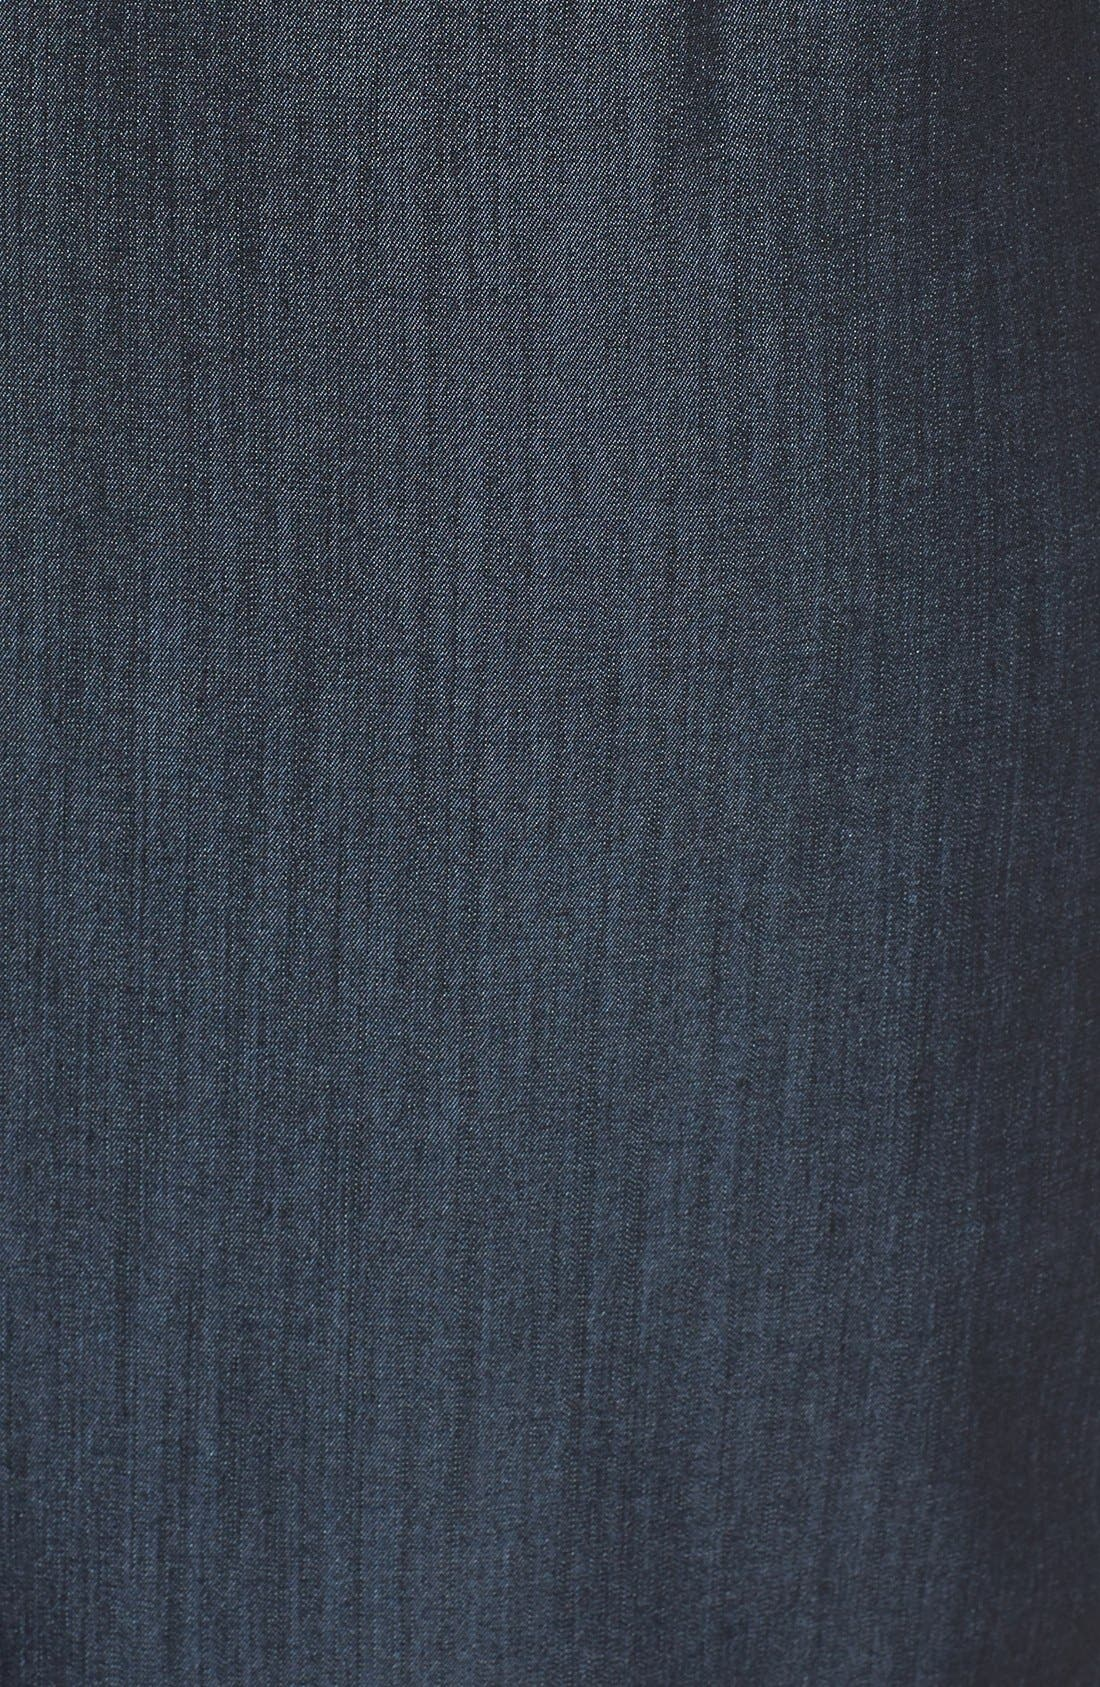 Alternate Image 3  - Jones New York 'Lucy - Seasonless Stretch' Pencil Skirt